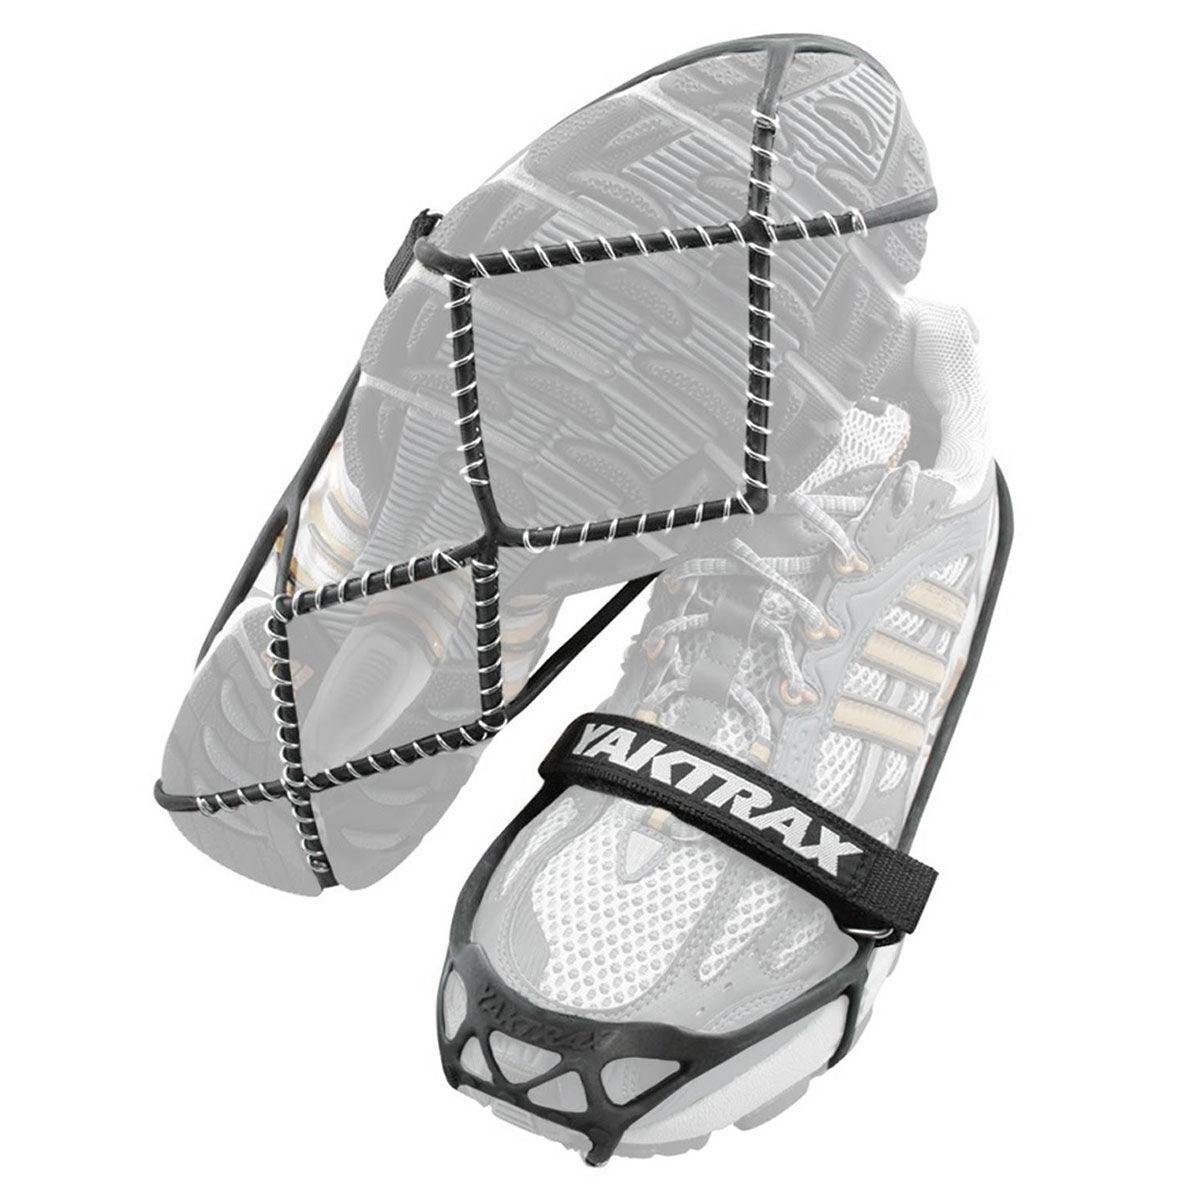 yaktrax-walk-traction-cleats